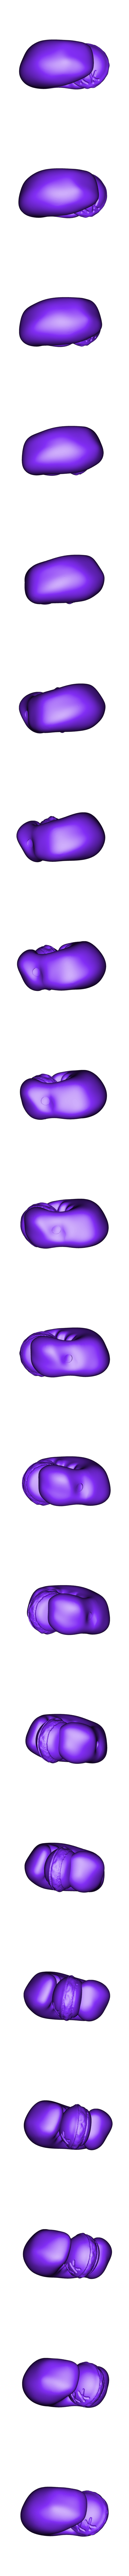 M.Krabs - Pince Droite.stl Download free STL file Mr. Krabs • 3D printable design, BODY3D